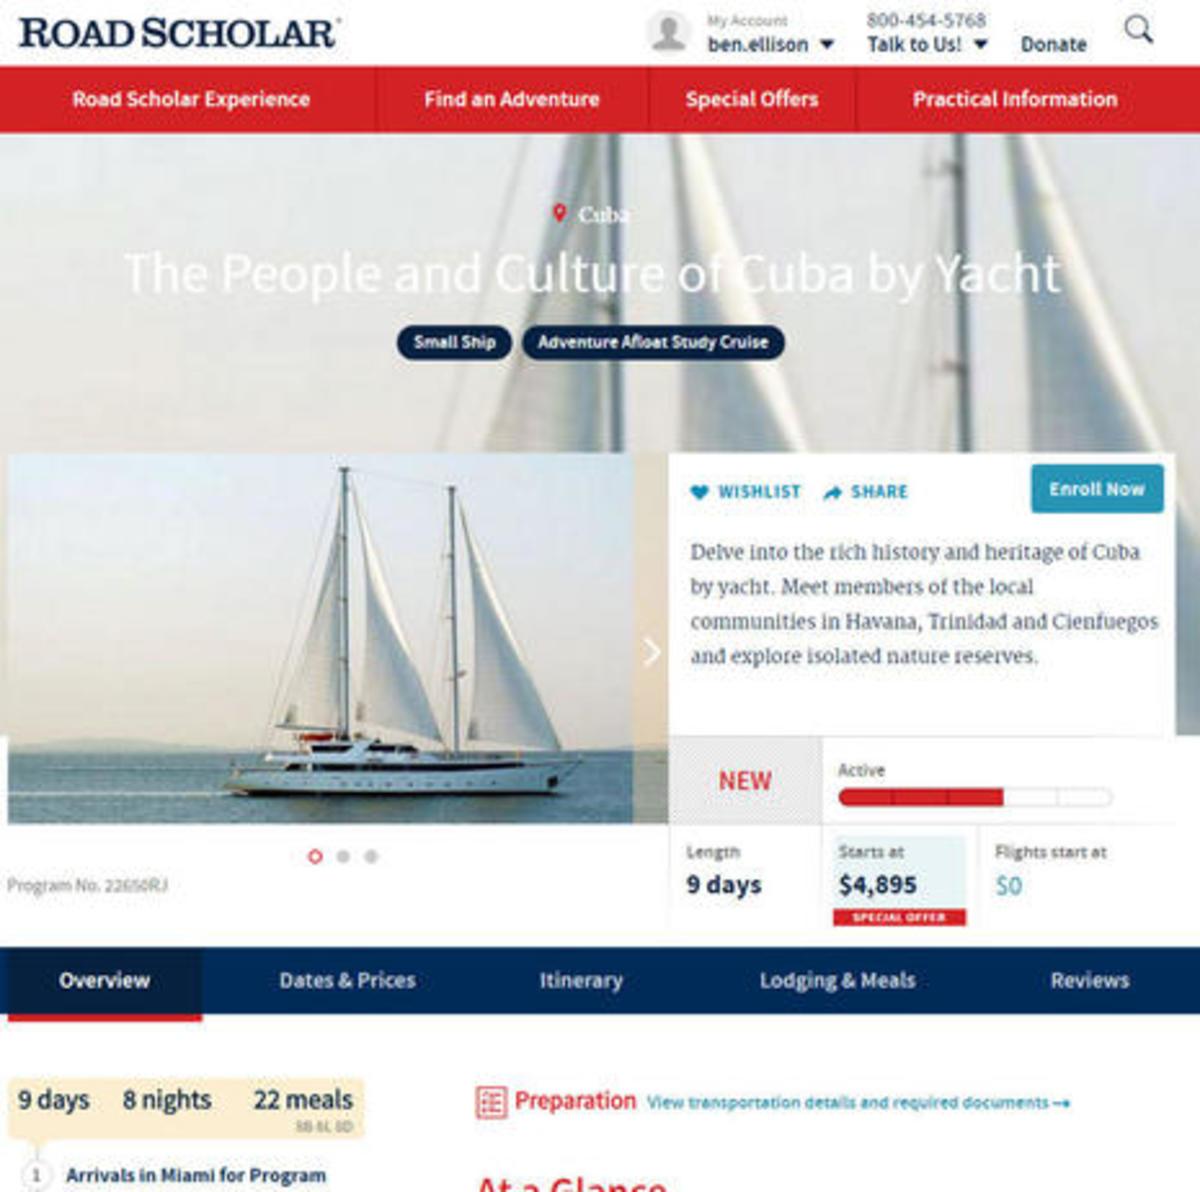 Road_Scholar_boat_cruise_Cuba_cPanbo.jpg